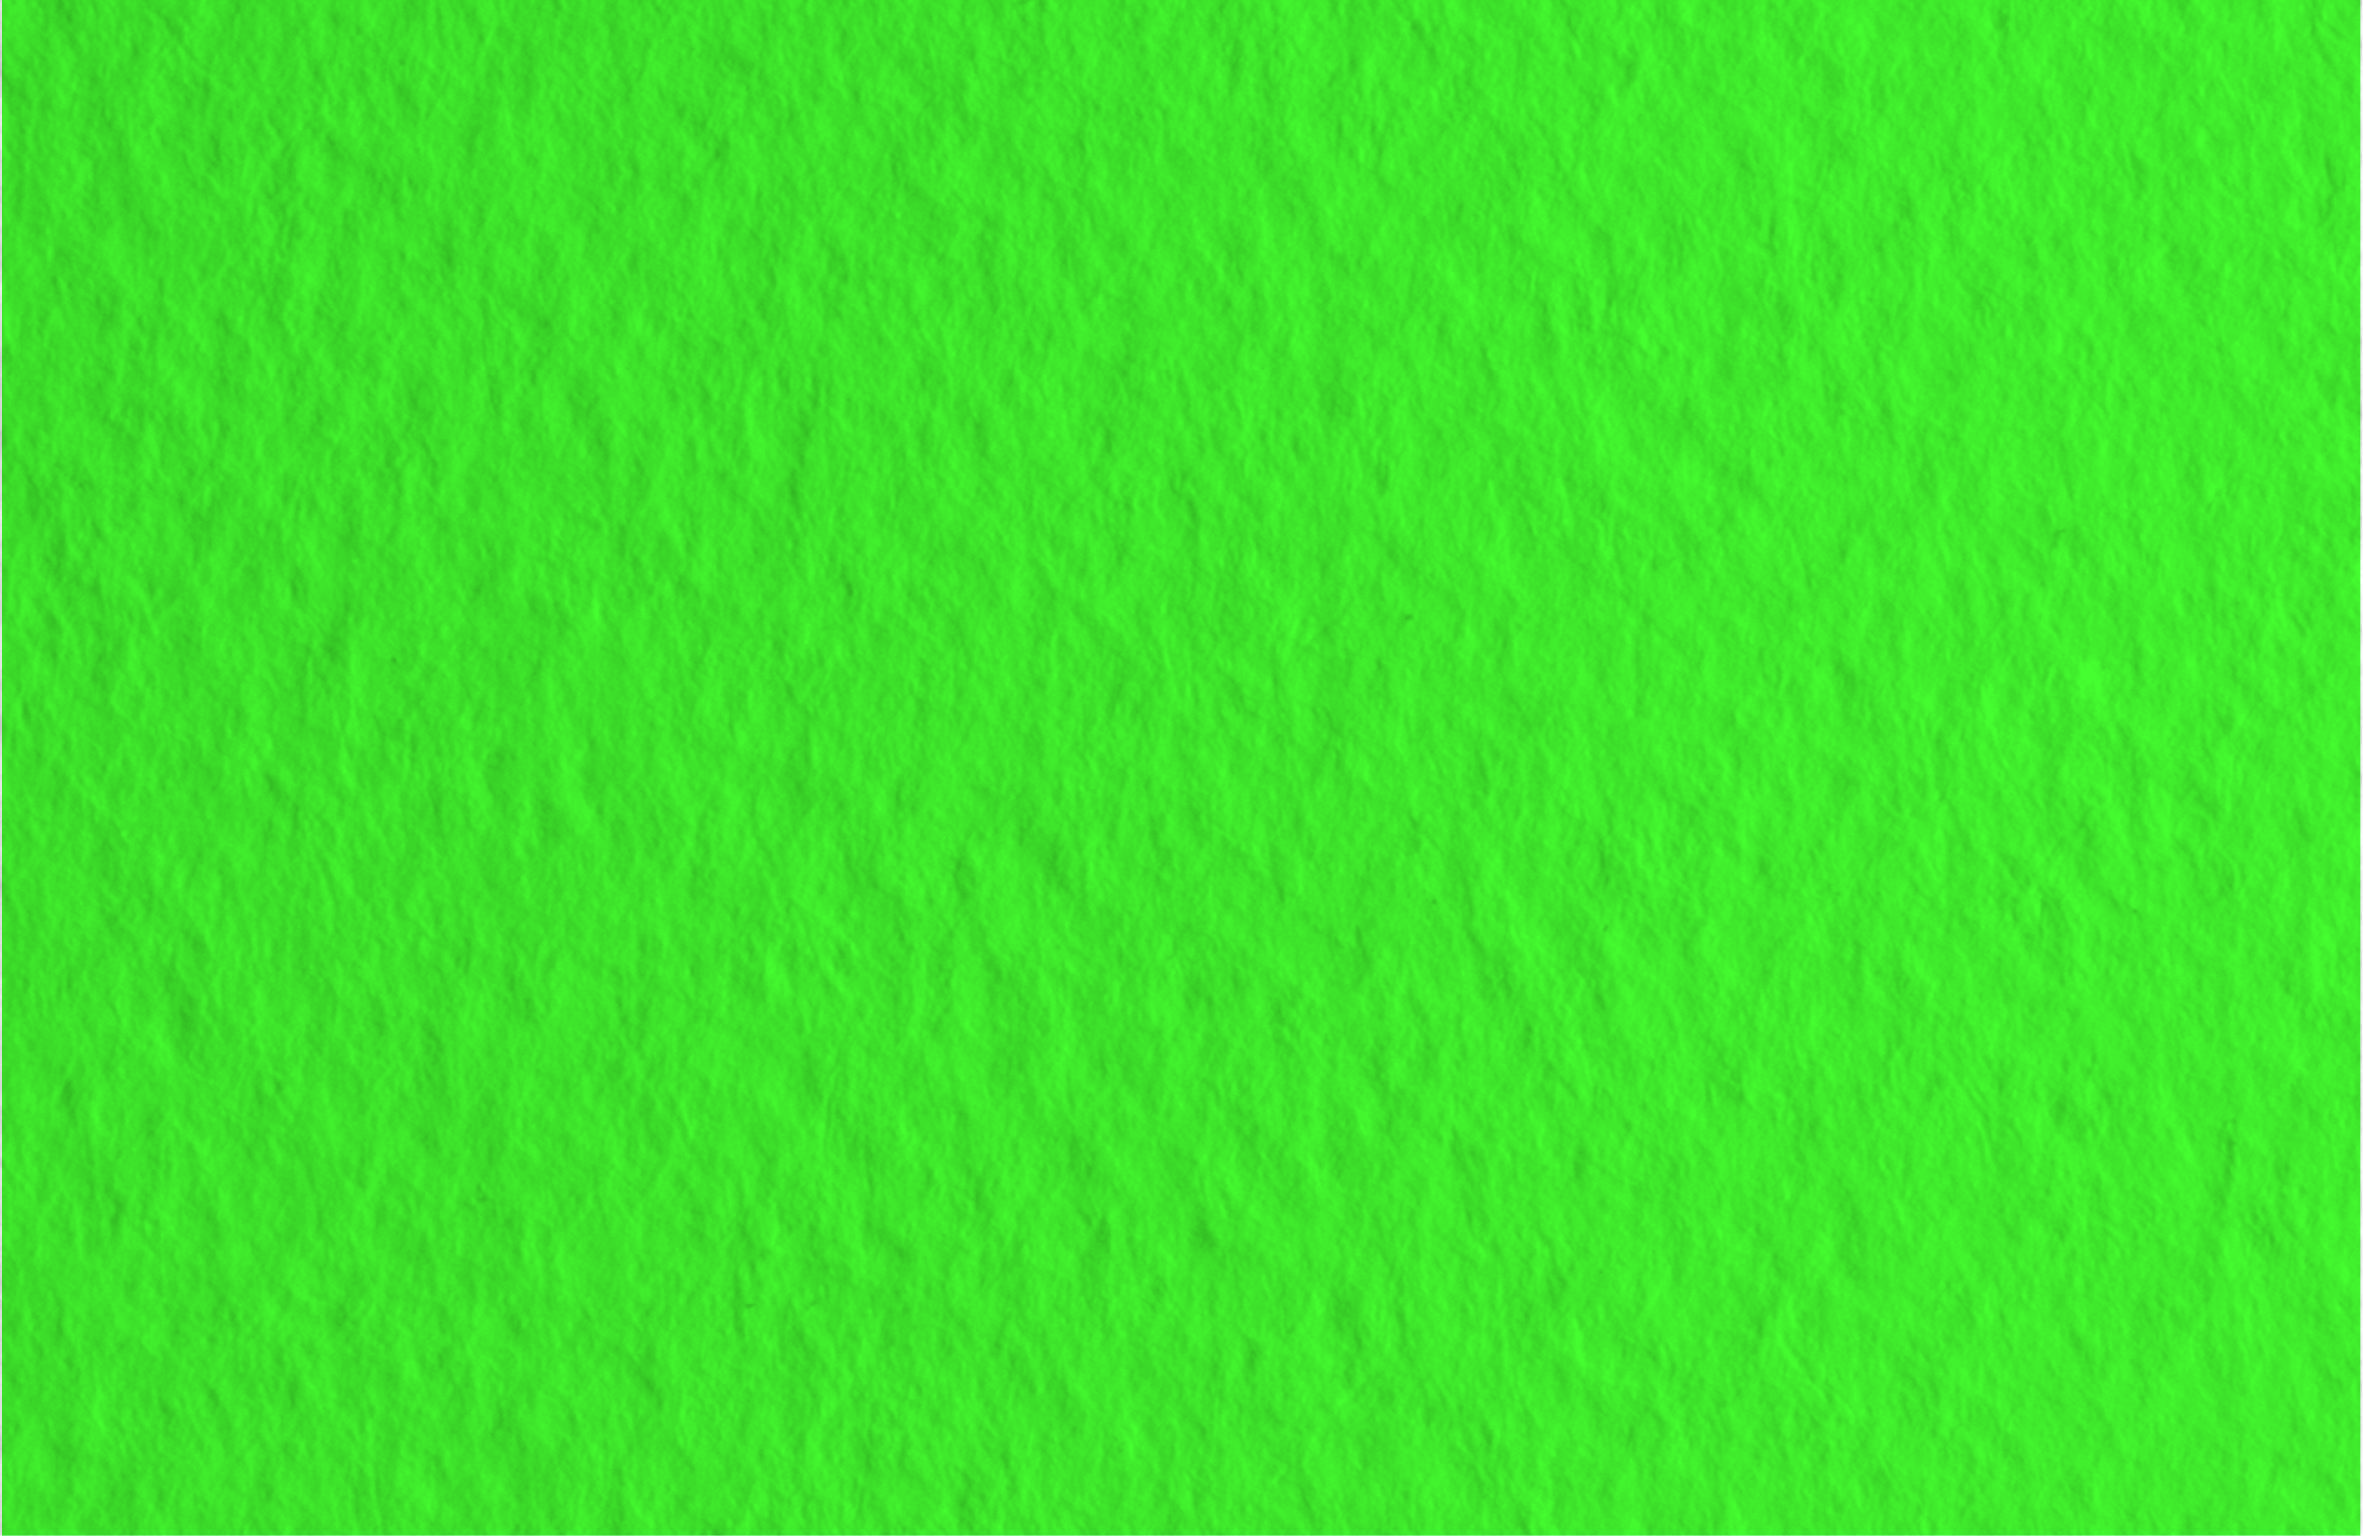 всячески зеленая картинка на бумаге магнит продает транс